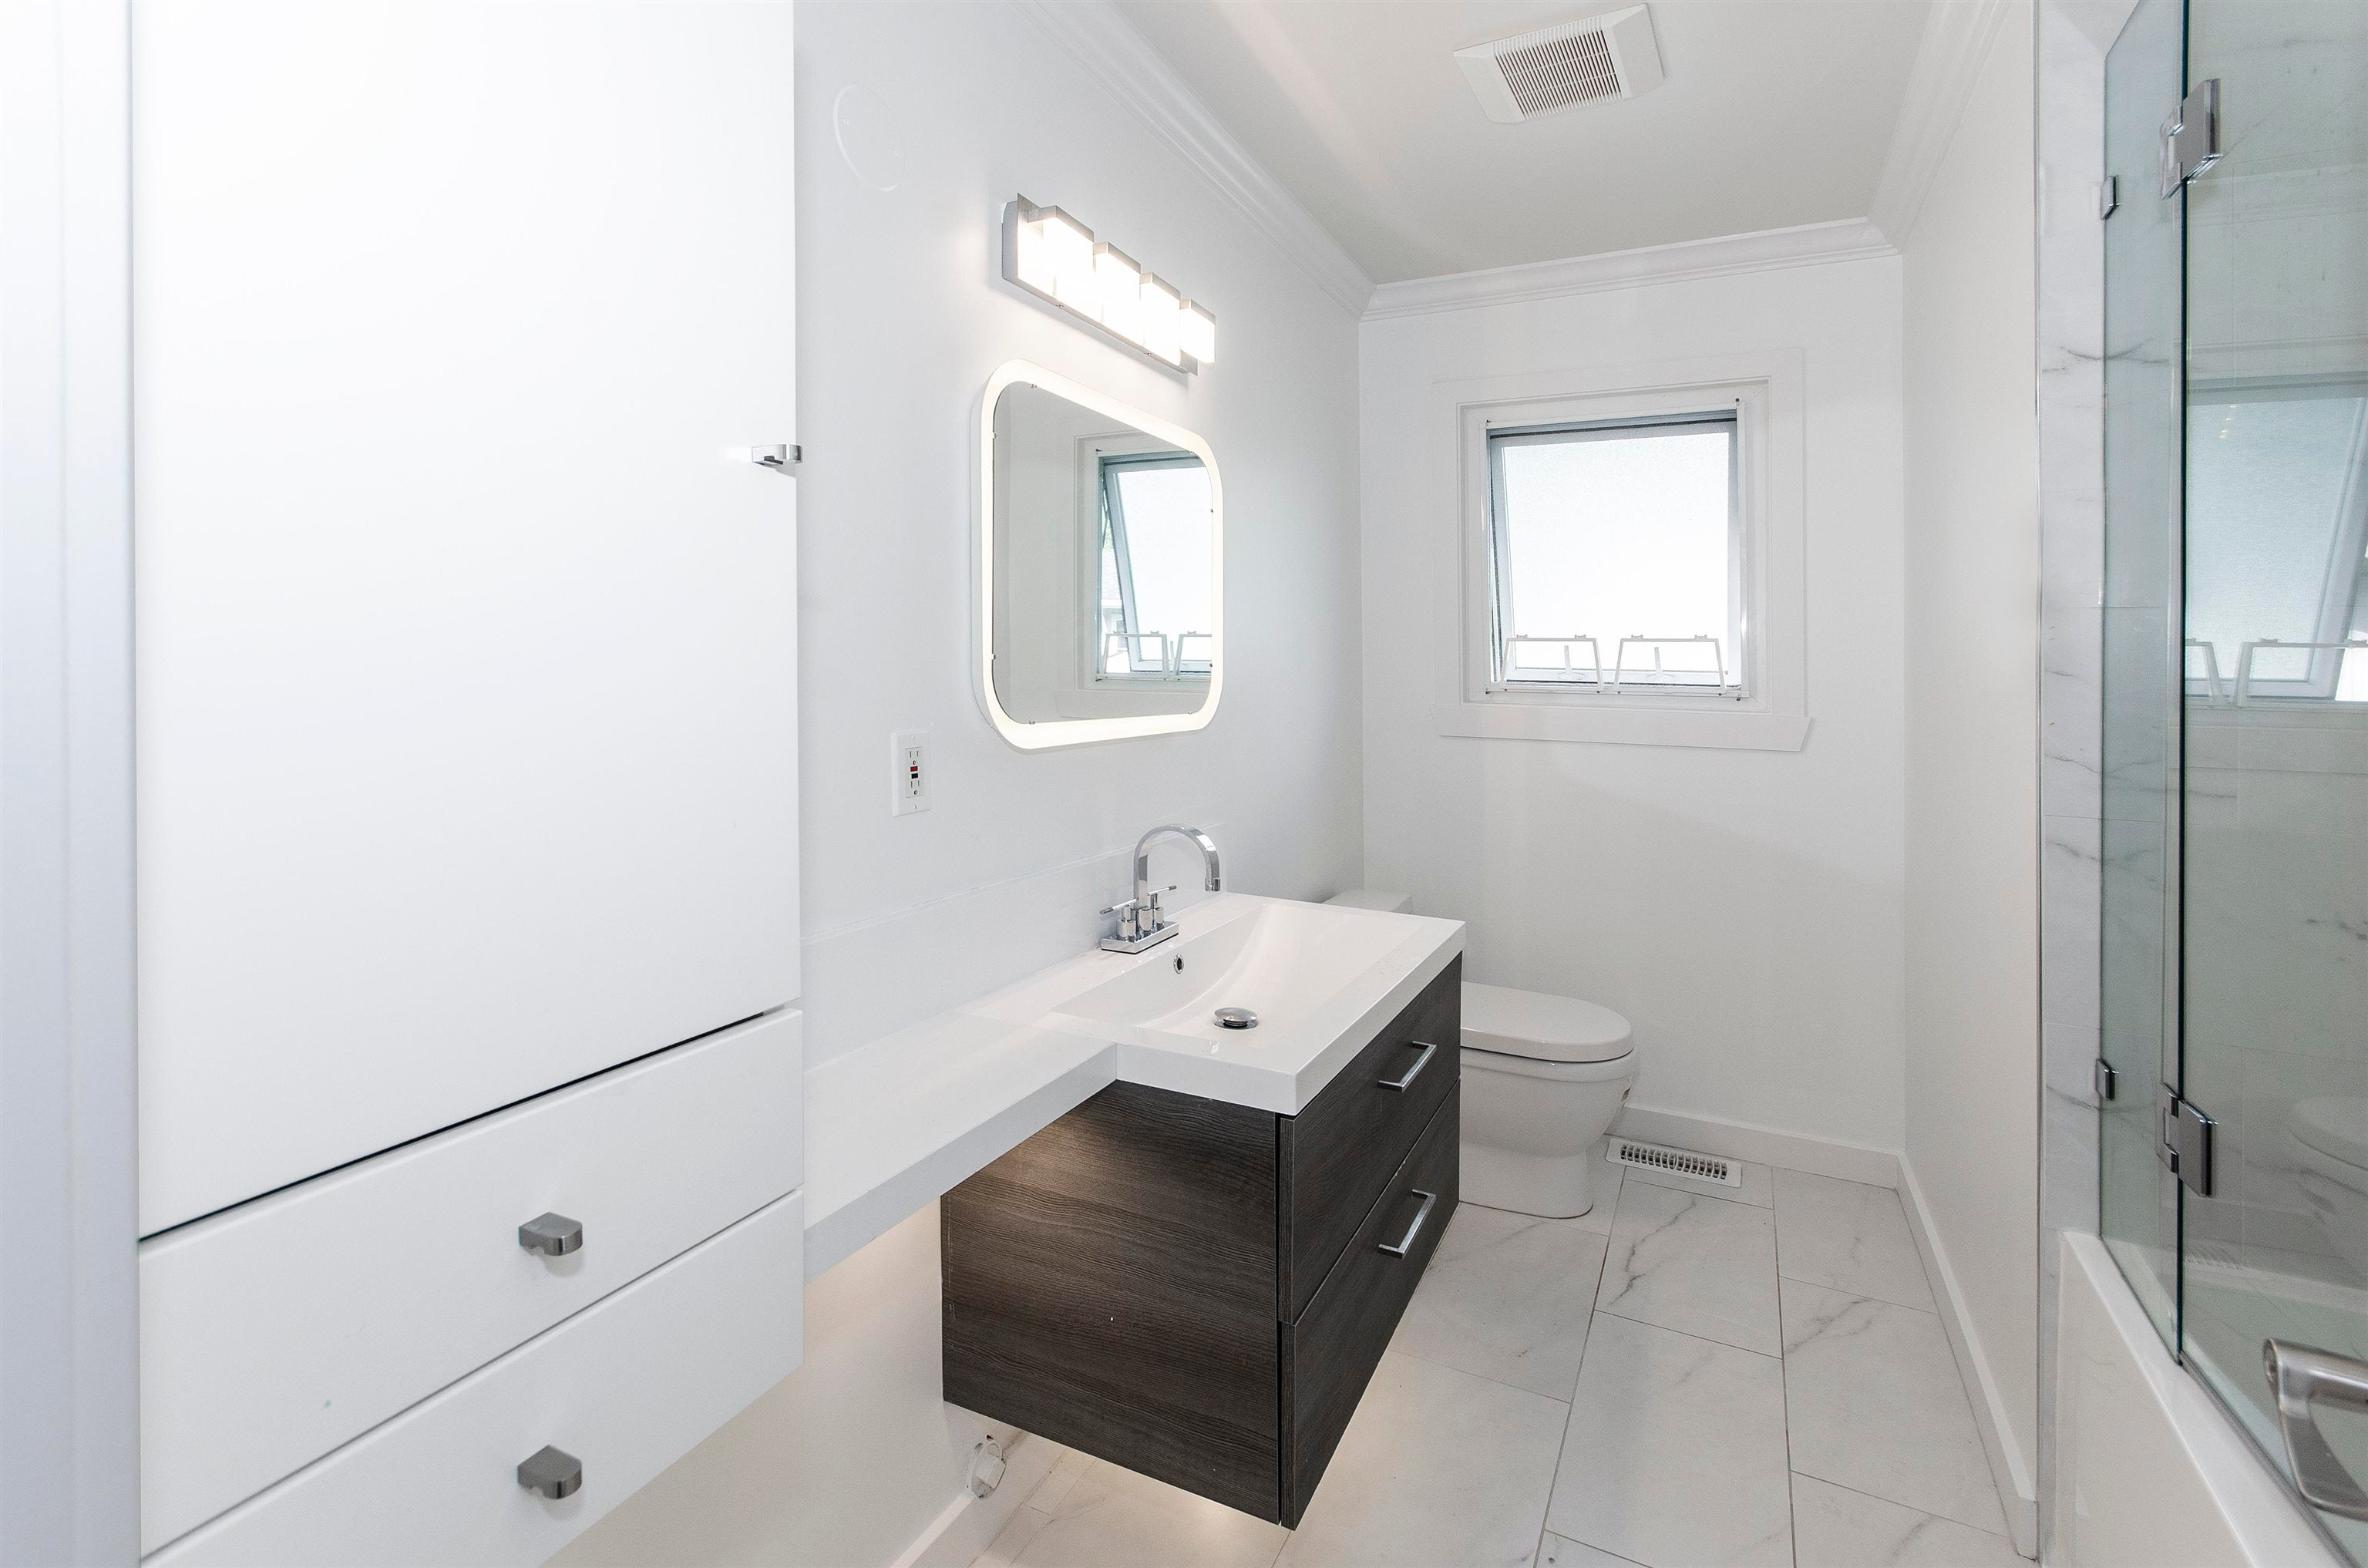 3785 REGENT AVENUE - Upper Lonsdale House/Single Family for sale, 4 Bedrooms (R2617648) - #16